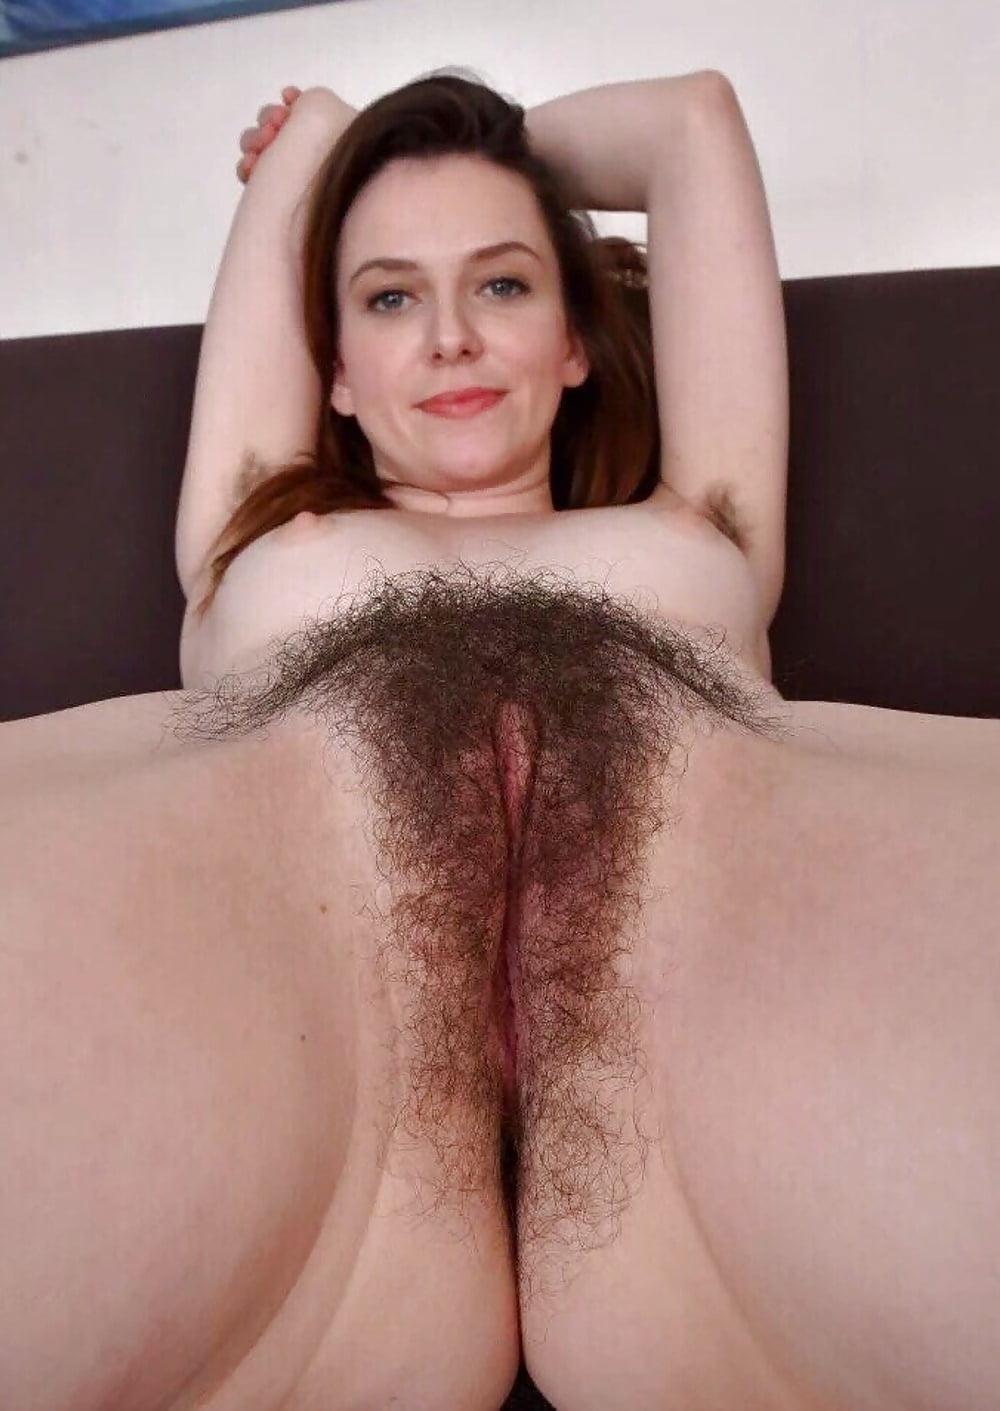 Hairy spurge